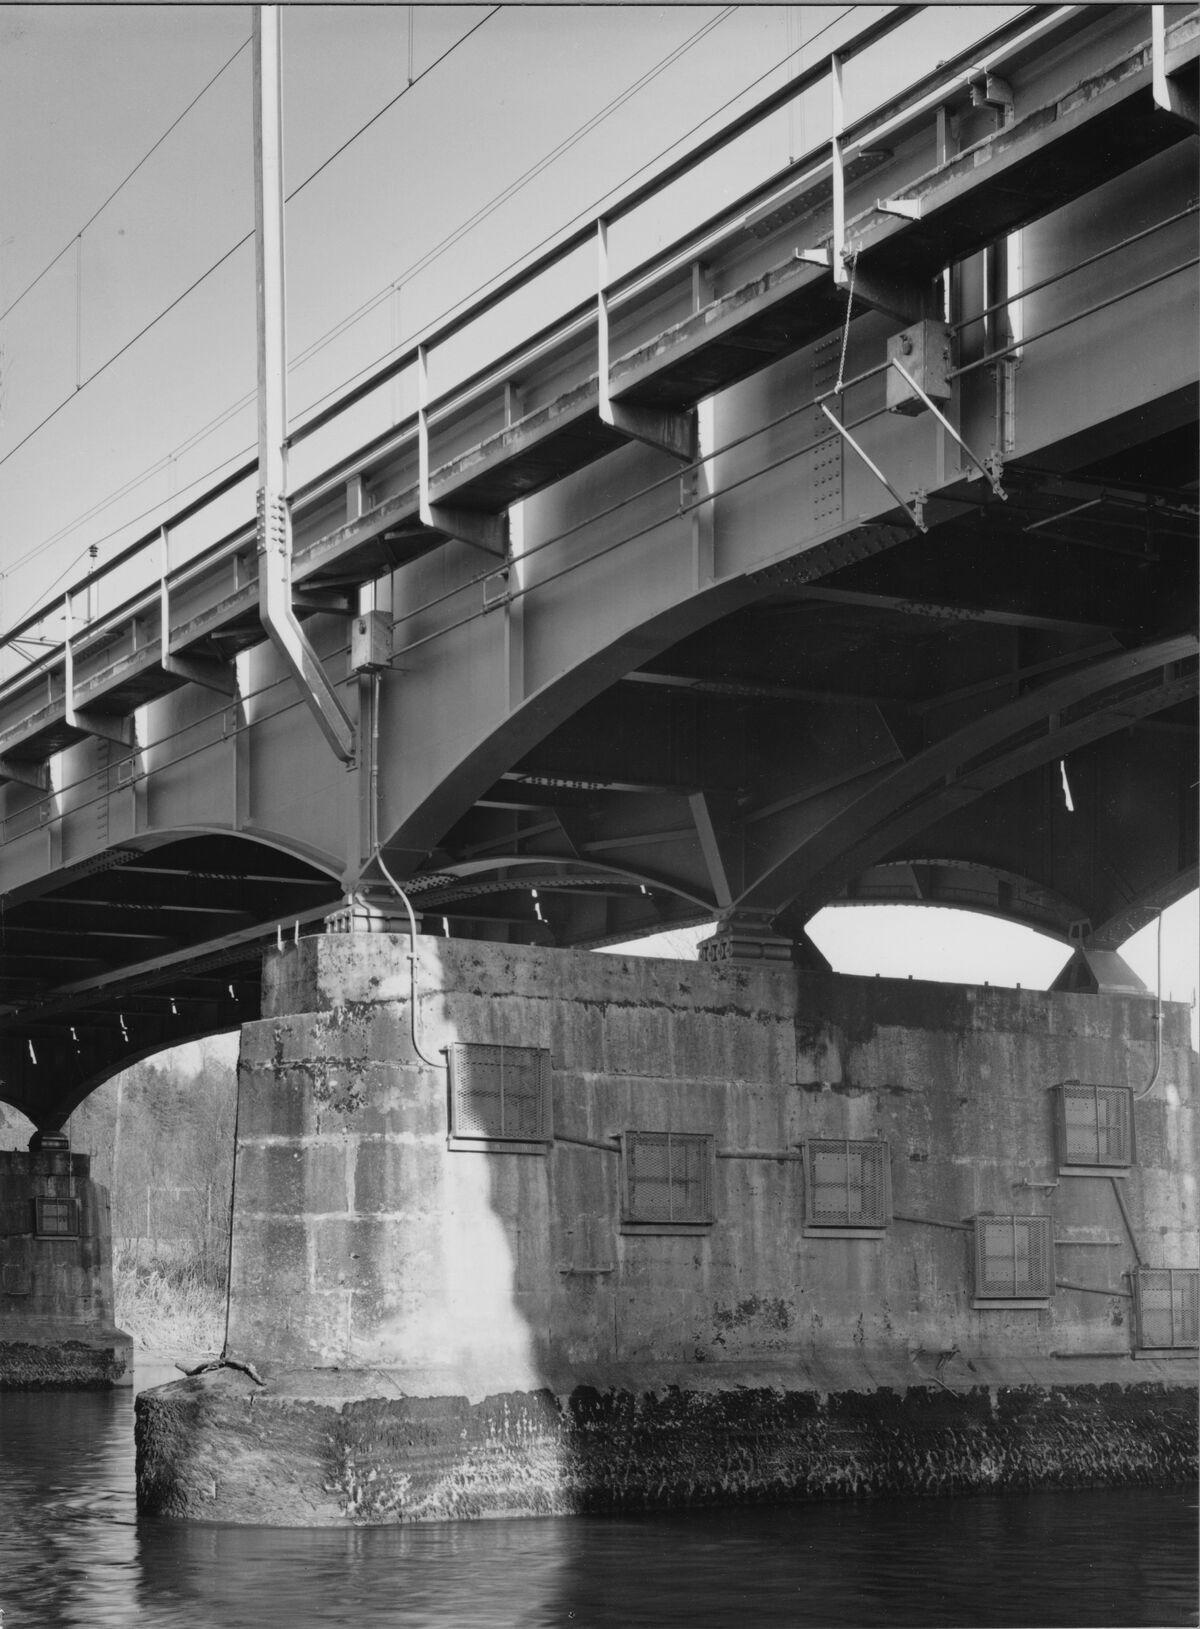 GFA 20/135.212: Stahl- und Brückenbau: Aarebrücke Wangen